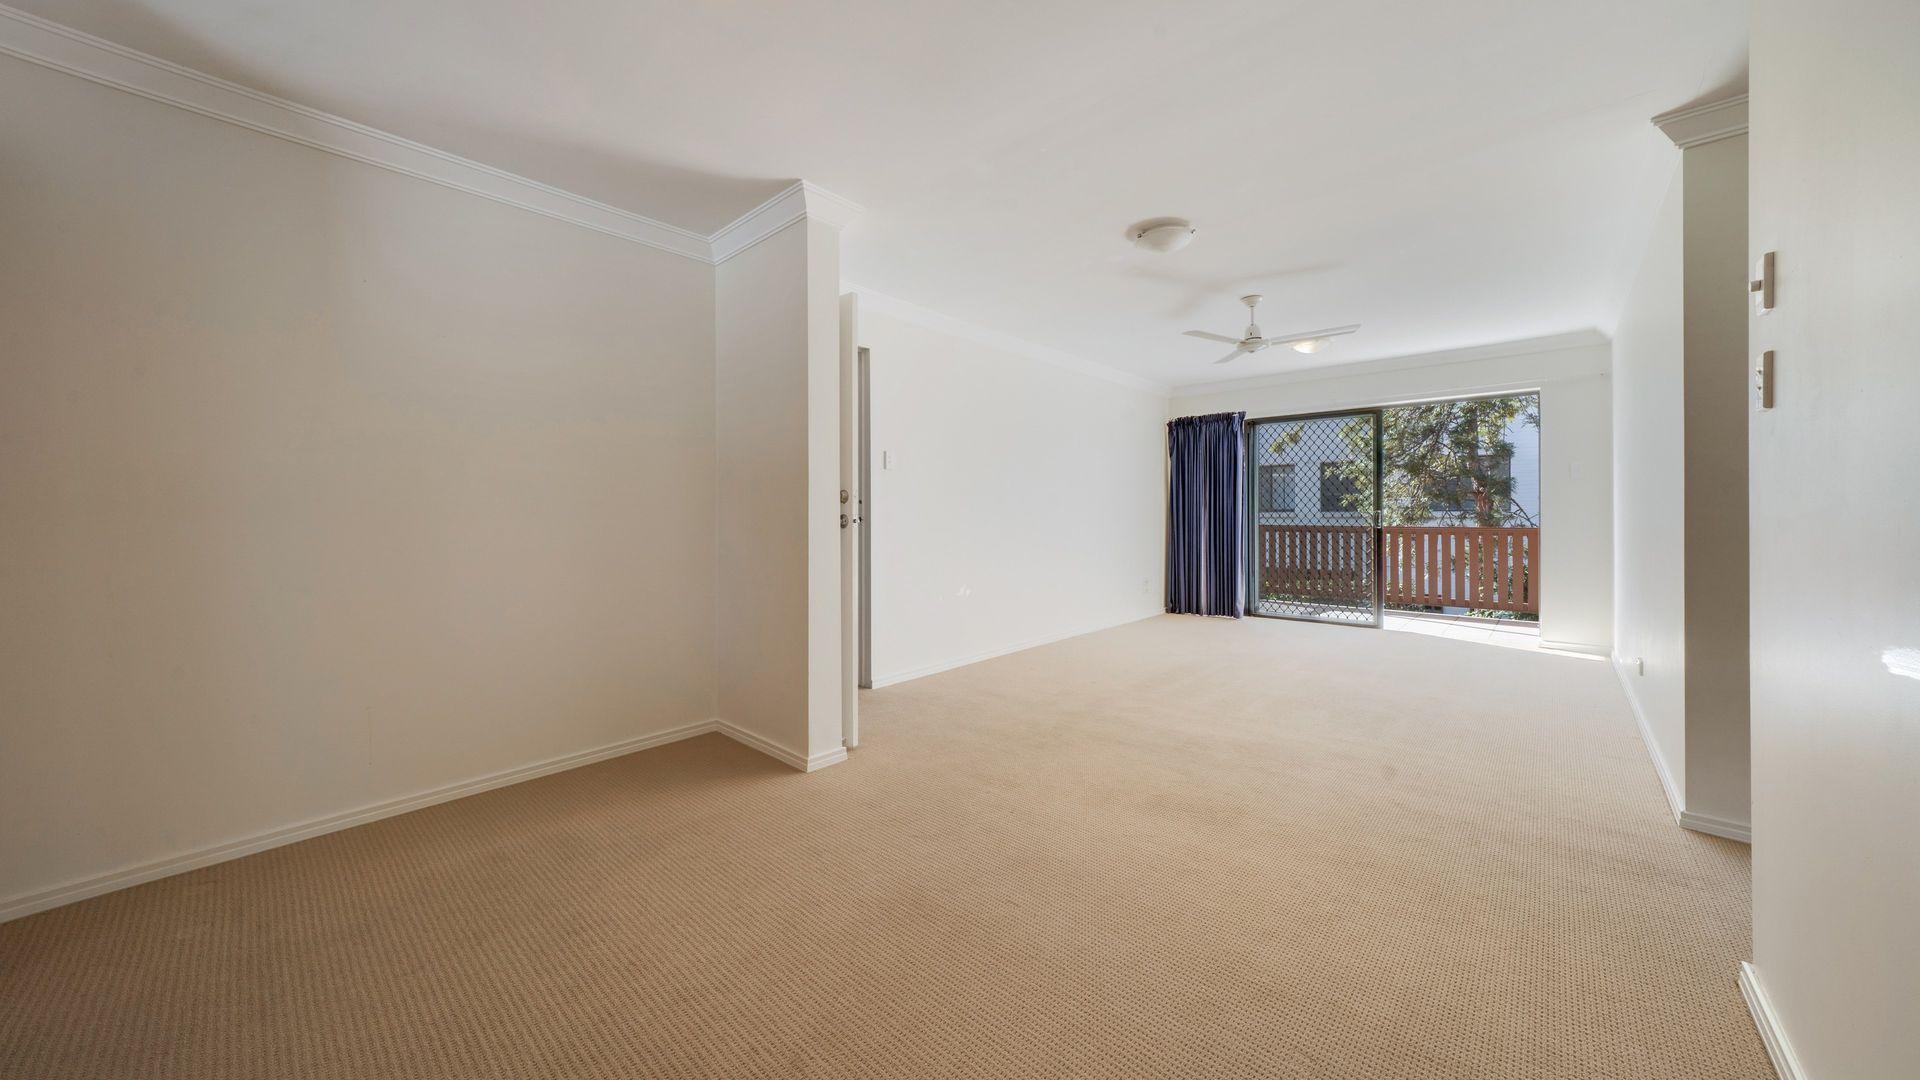 1/40 Upper Lancaster Rd, Ascot QLD 4007, Image 2